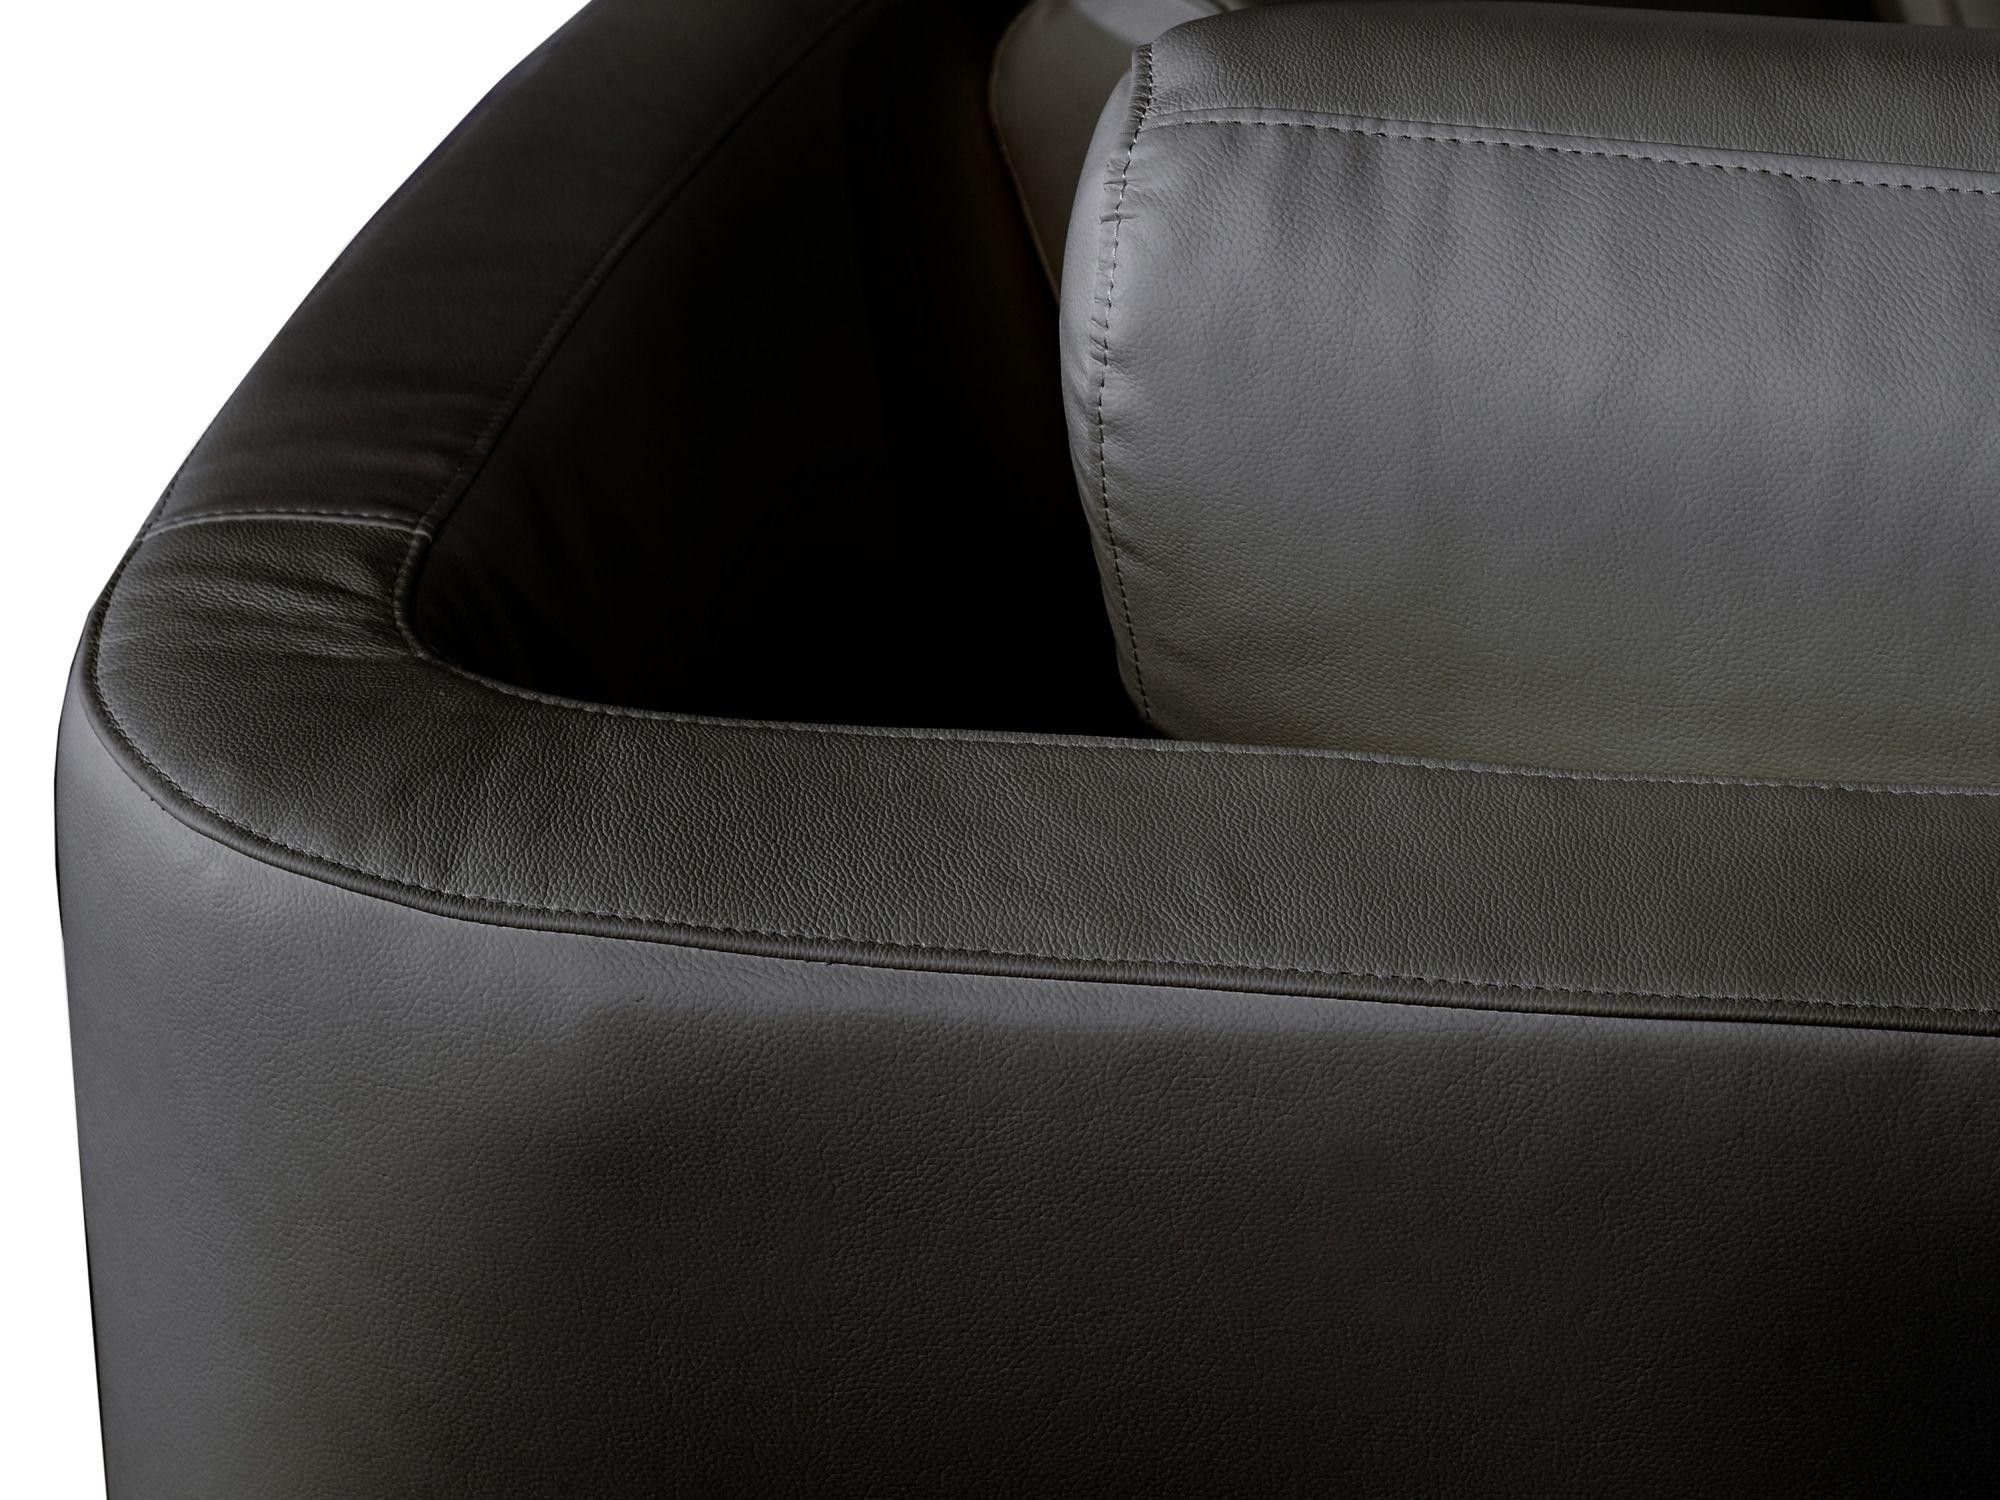 Ledersofa rundes Sofa Ledercouch Couch aus Leder in schwarz